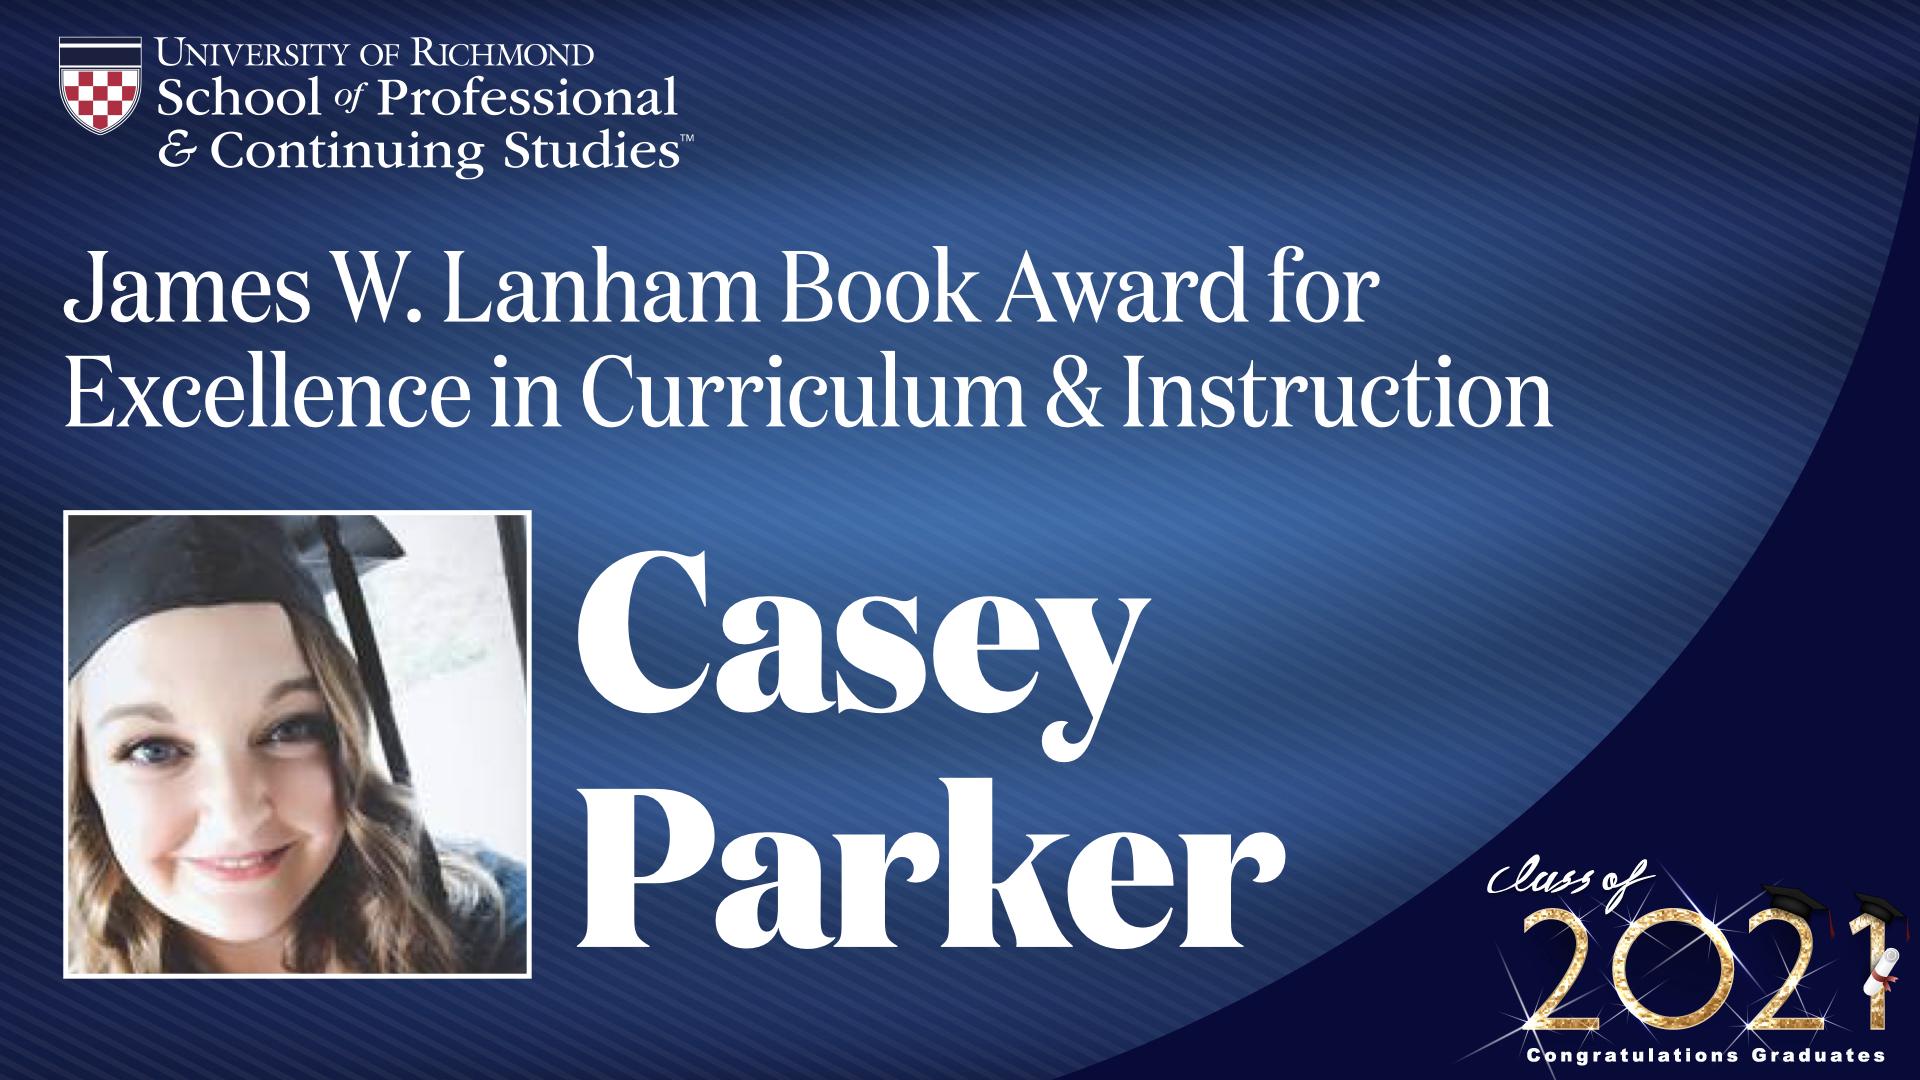 Casey Parker headshot and award name